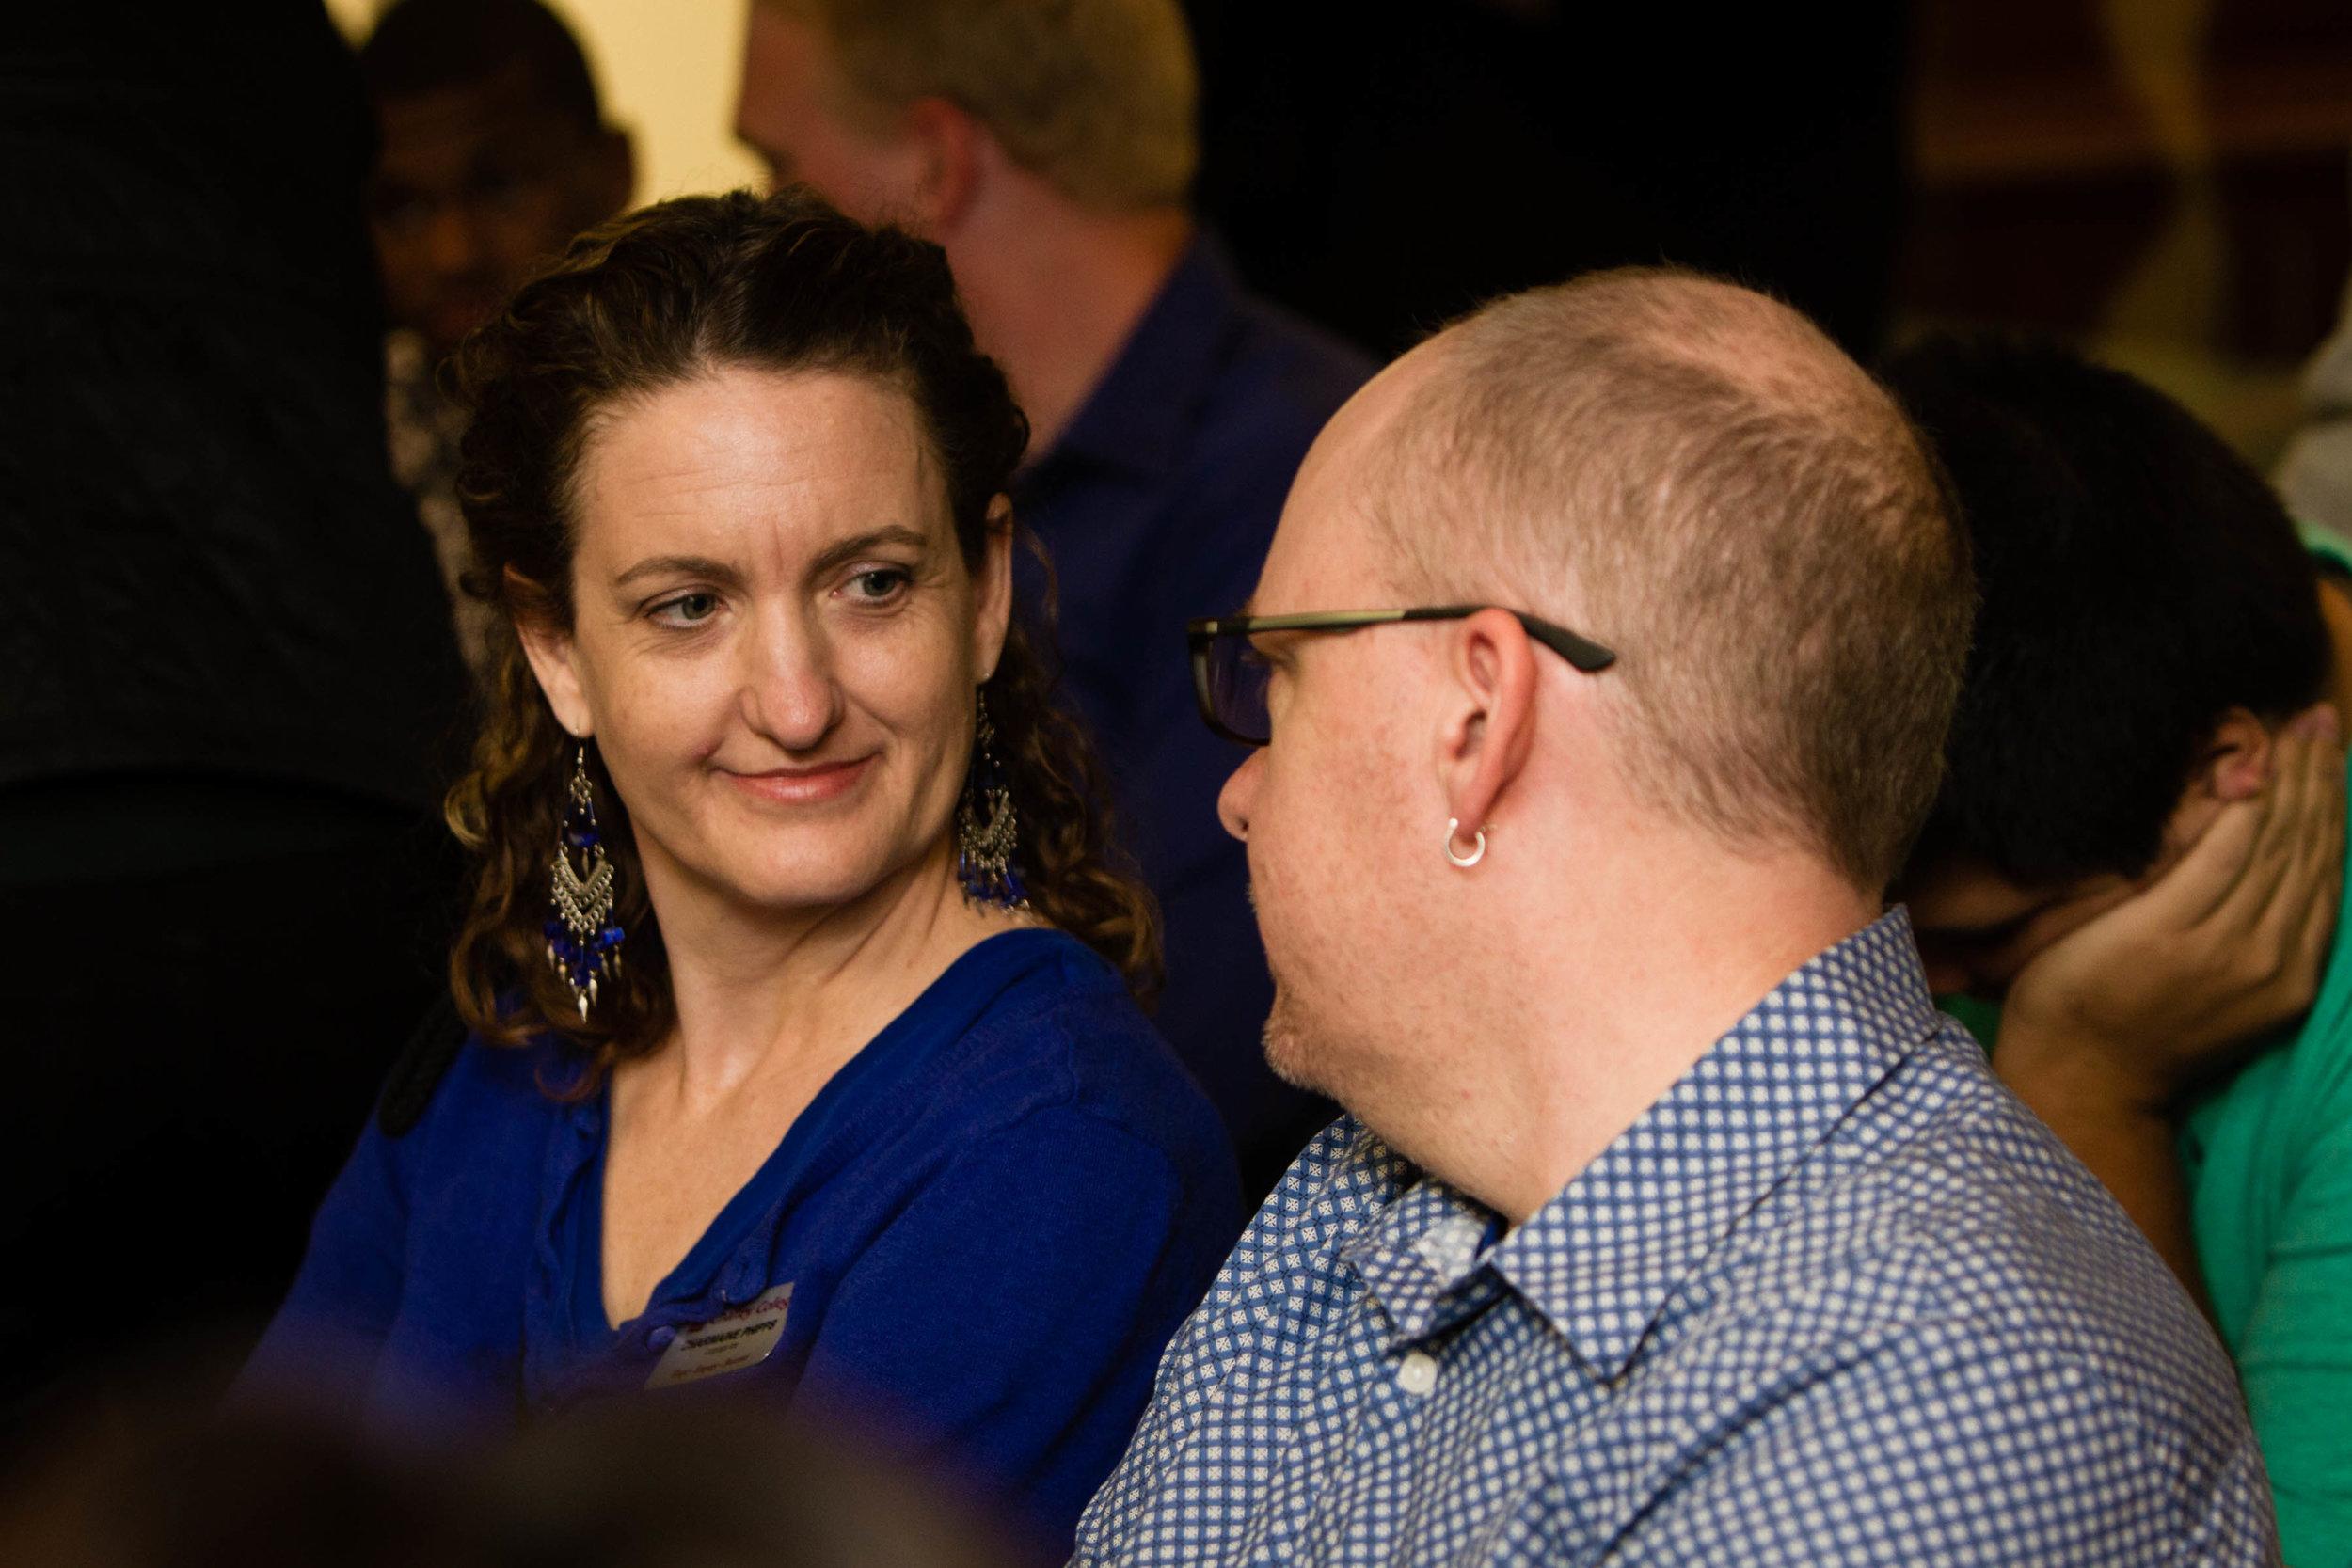 English and Journalism Coordinator Neil Watkins speaks to ESL teacher Charmaine Phipps Thu. Dec. 15. Photo by Duane Tkatch.